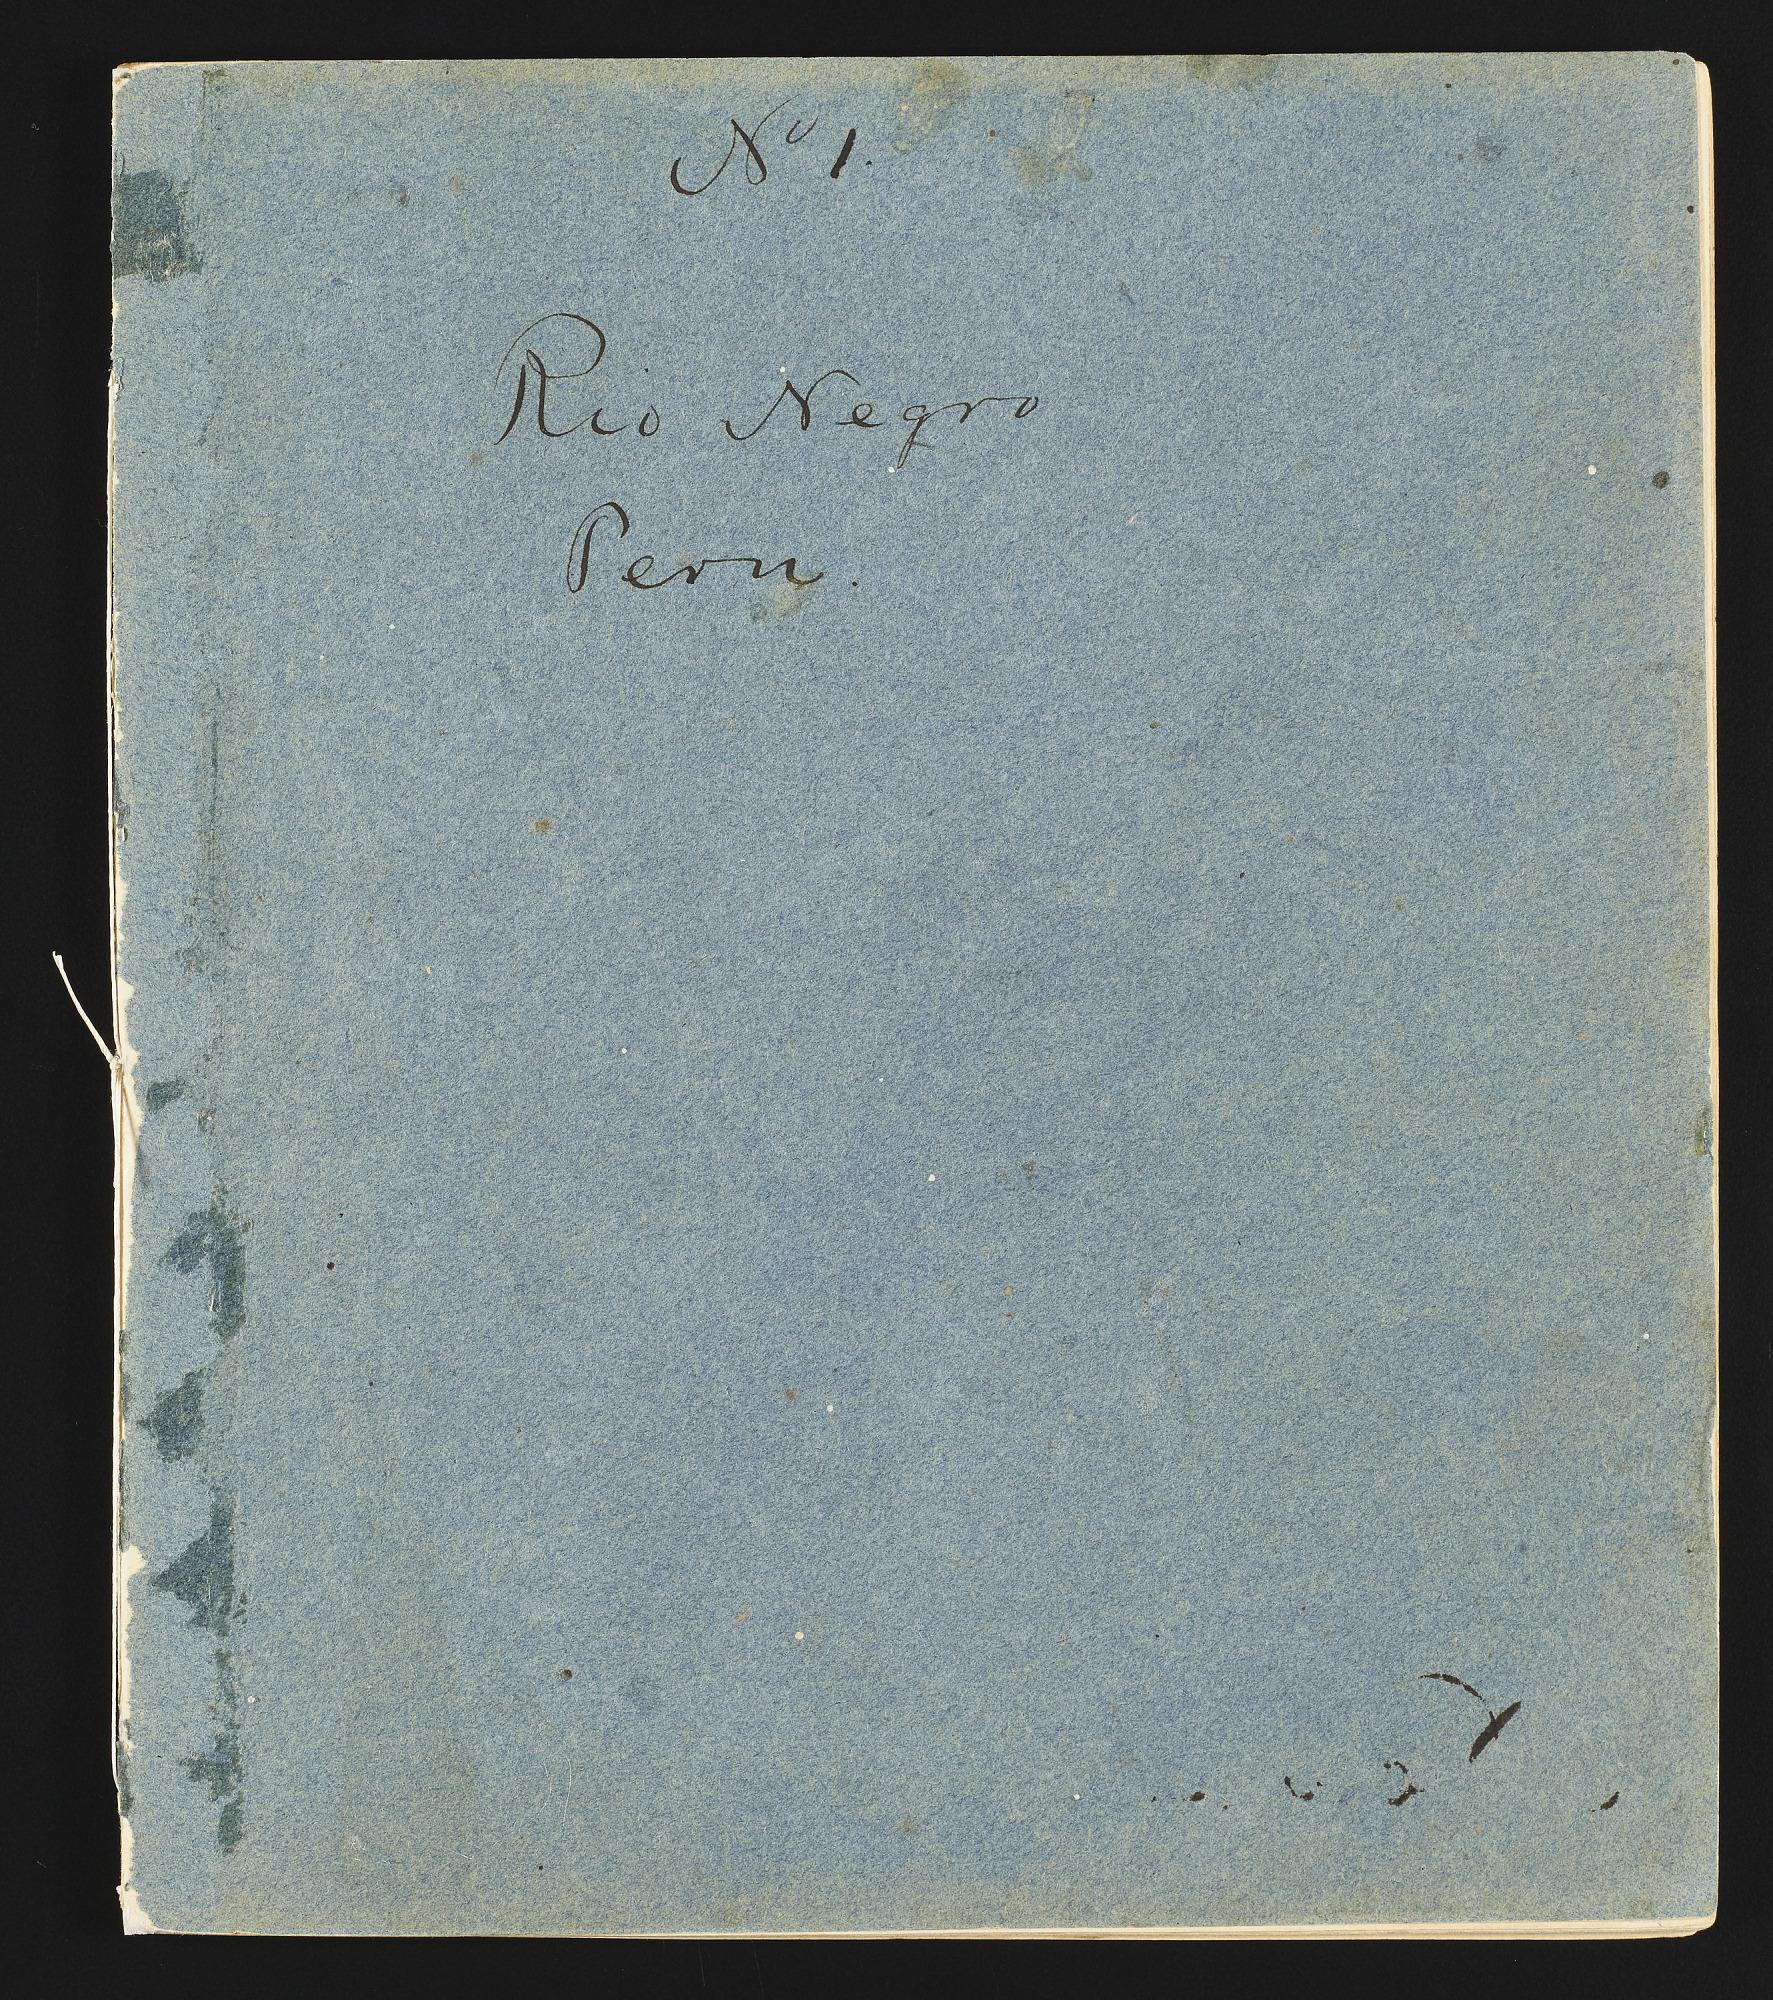 Original notebooks of the botanist, volumes 1 - 4, Peru